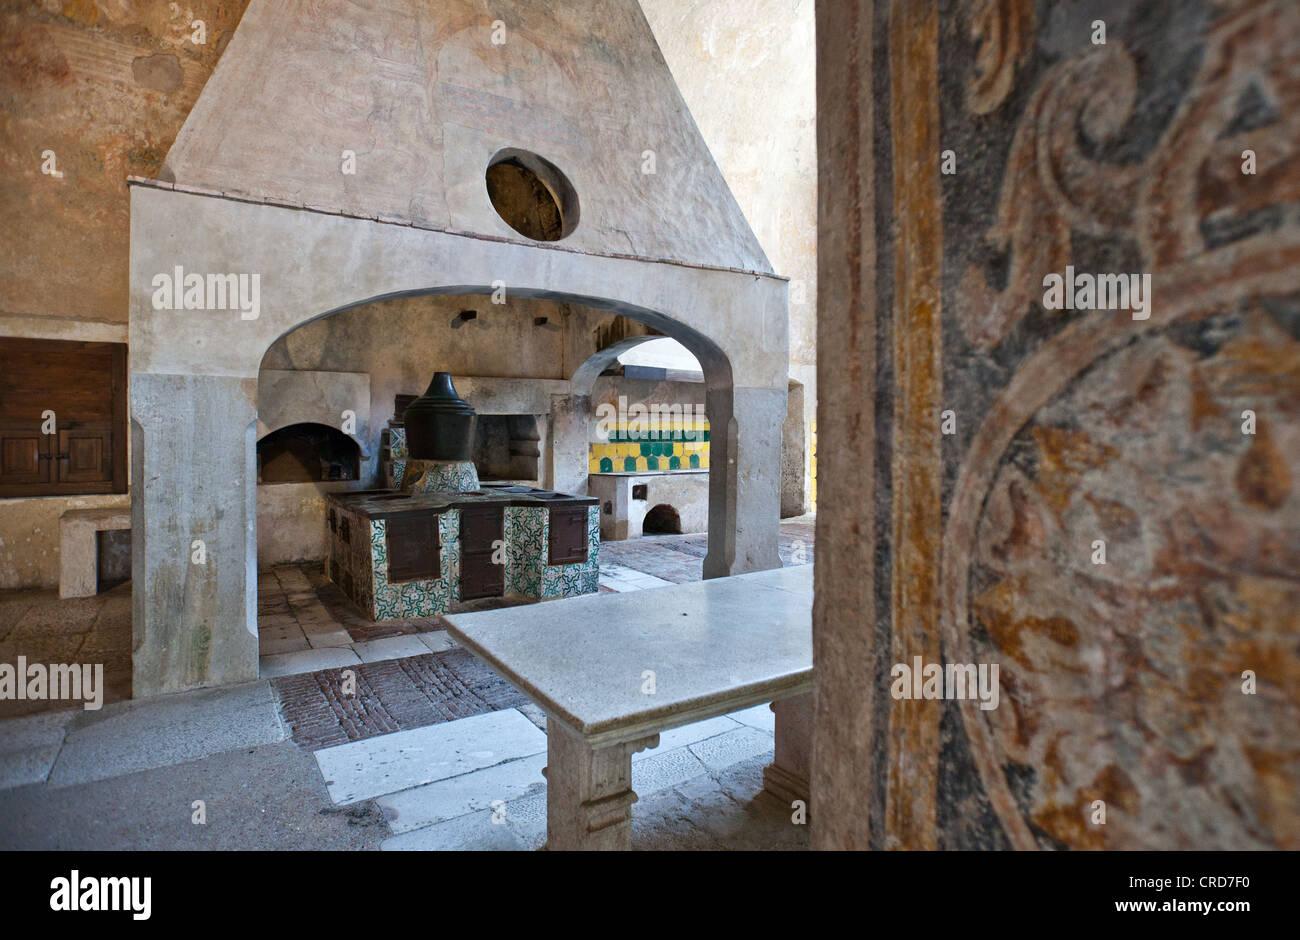 Europe Italy,Cilento, Padula, the kitchens of the Certosa of San Lorenzo - Stock Image